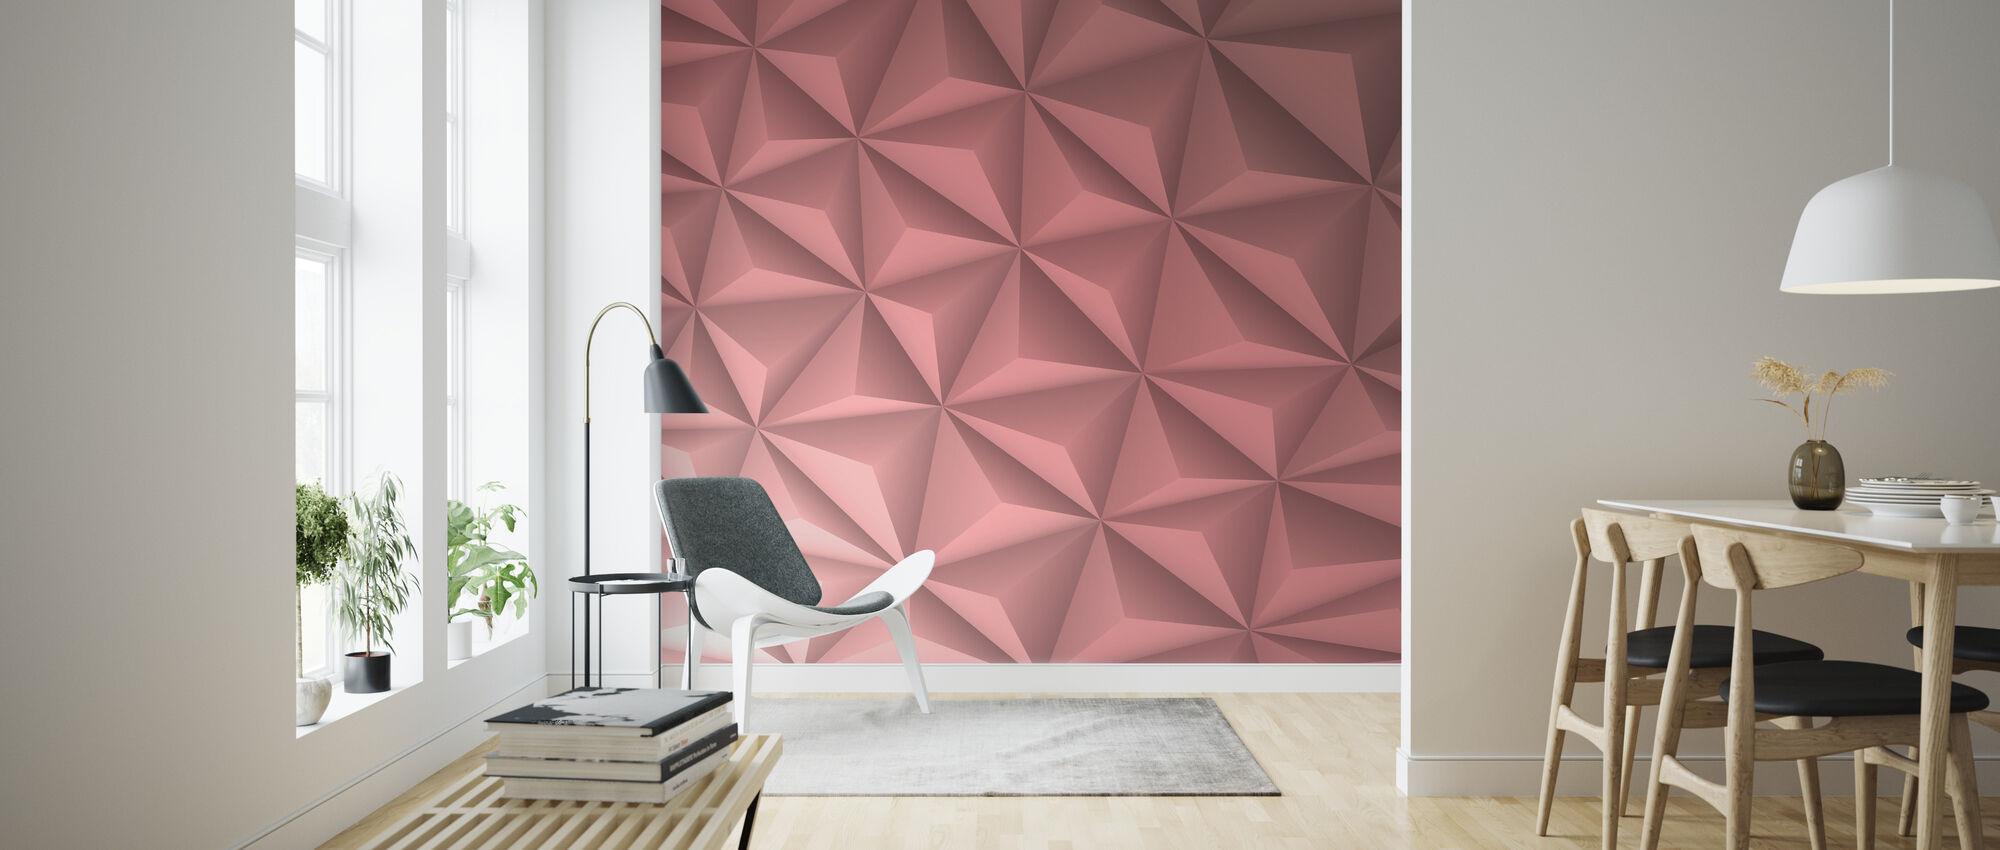 Roze Geometrisch - Behang - Woonkamer